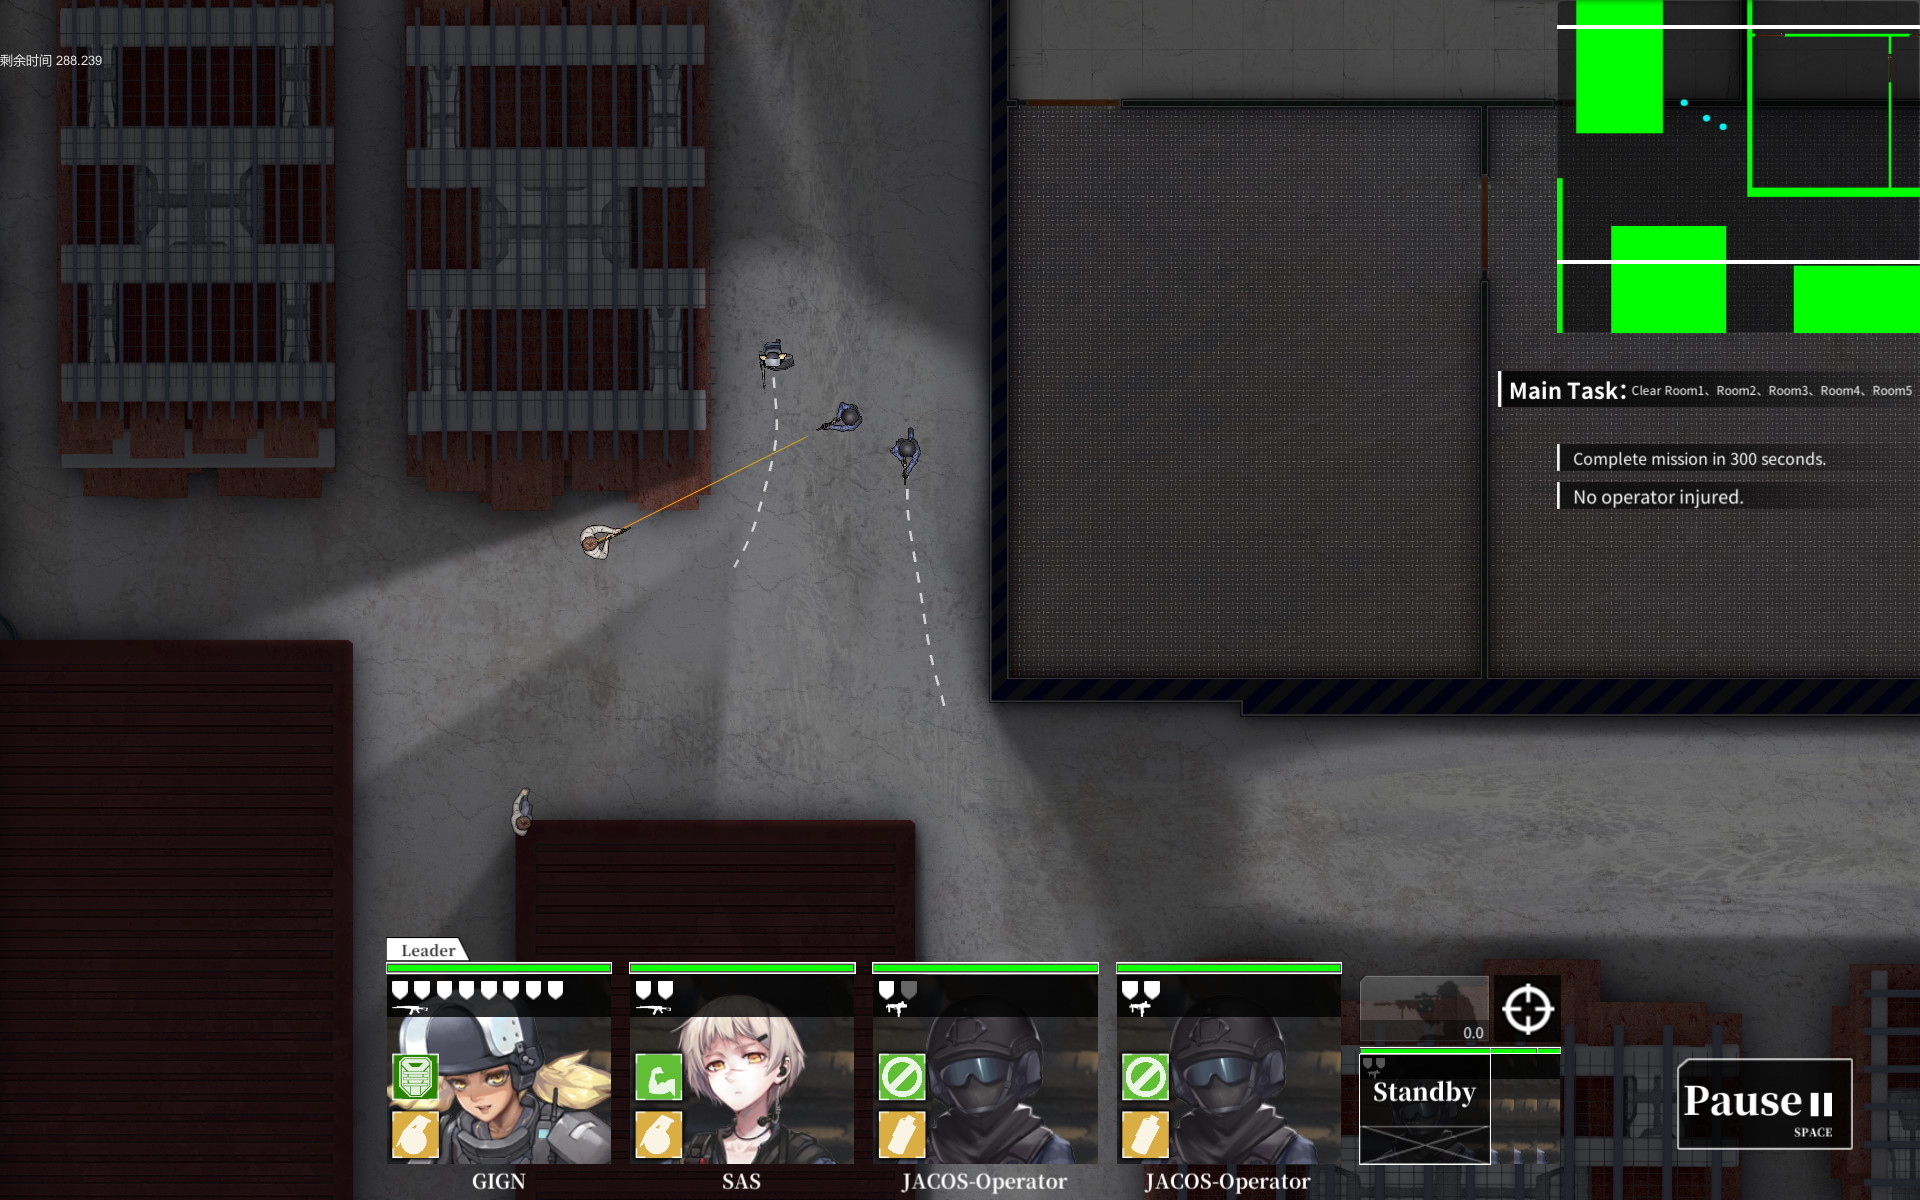 10-4 Indirect Contact screenshot